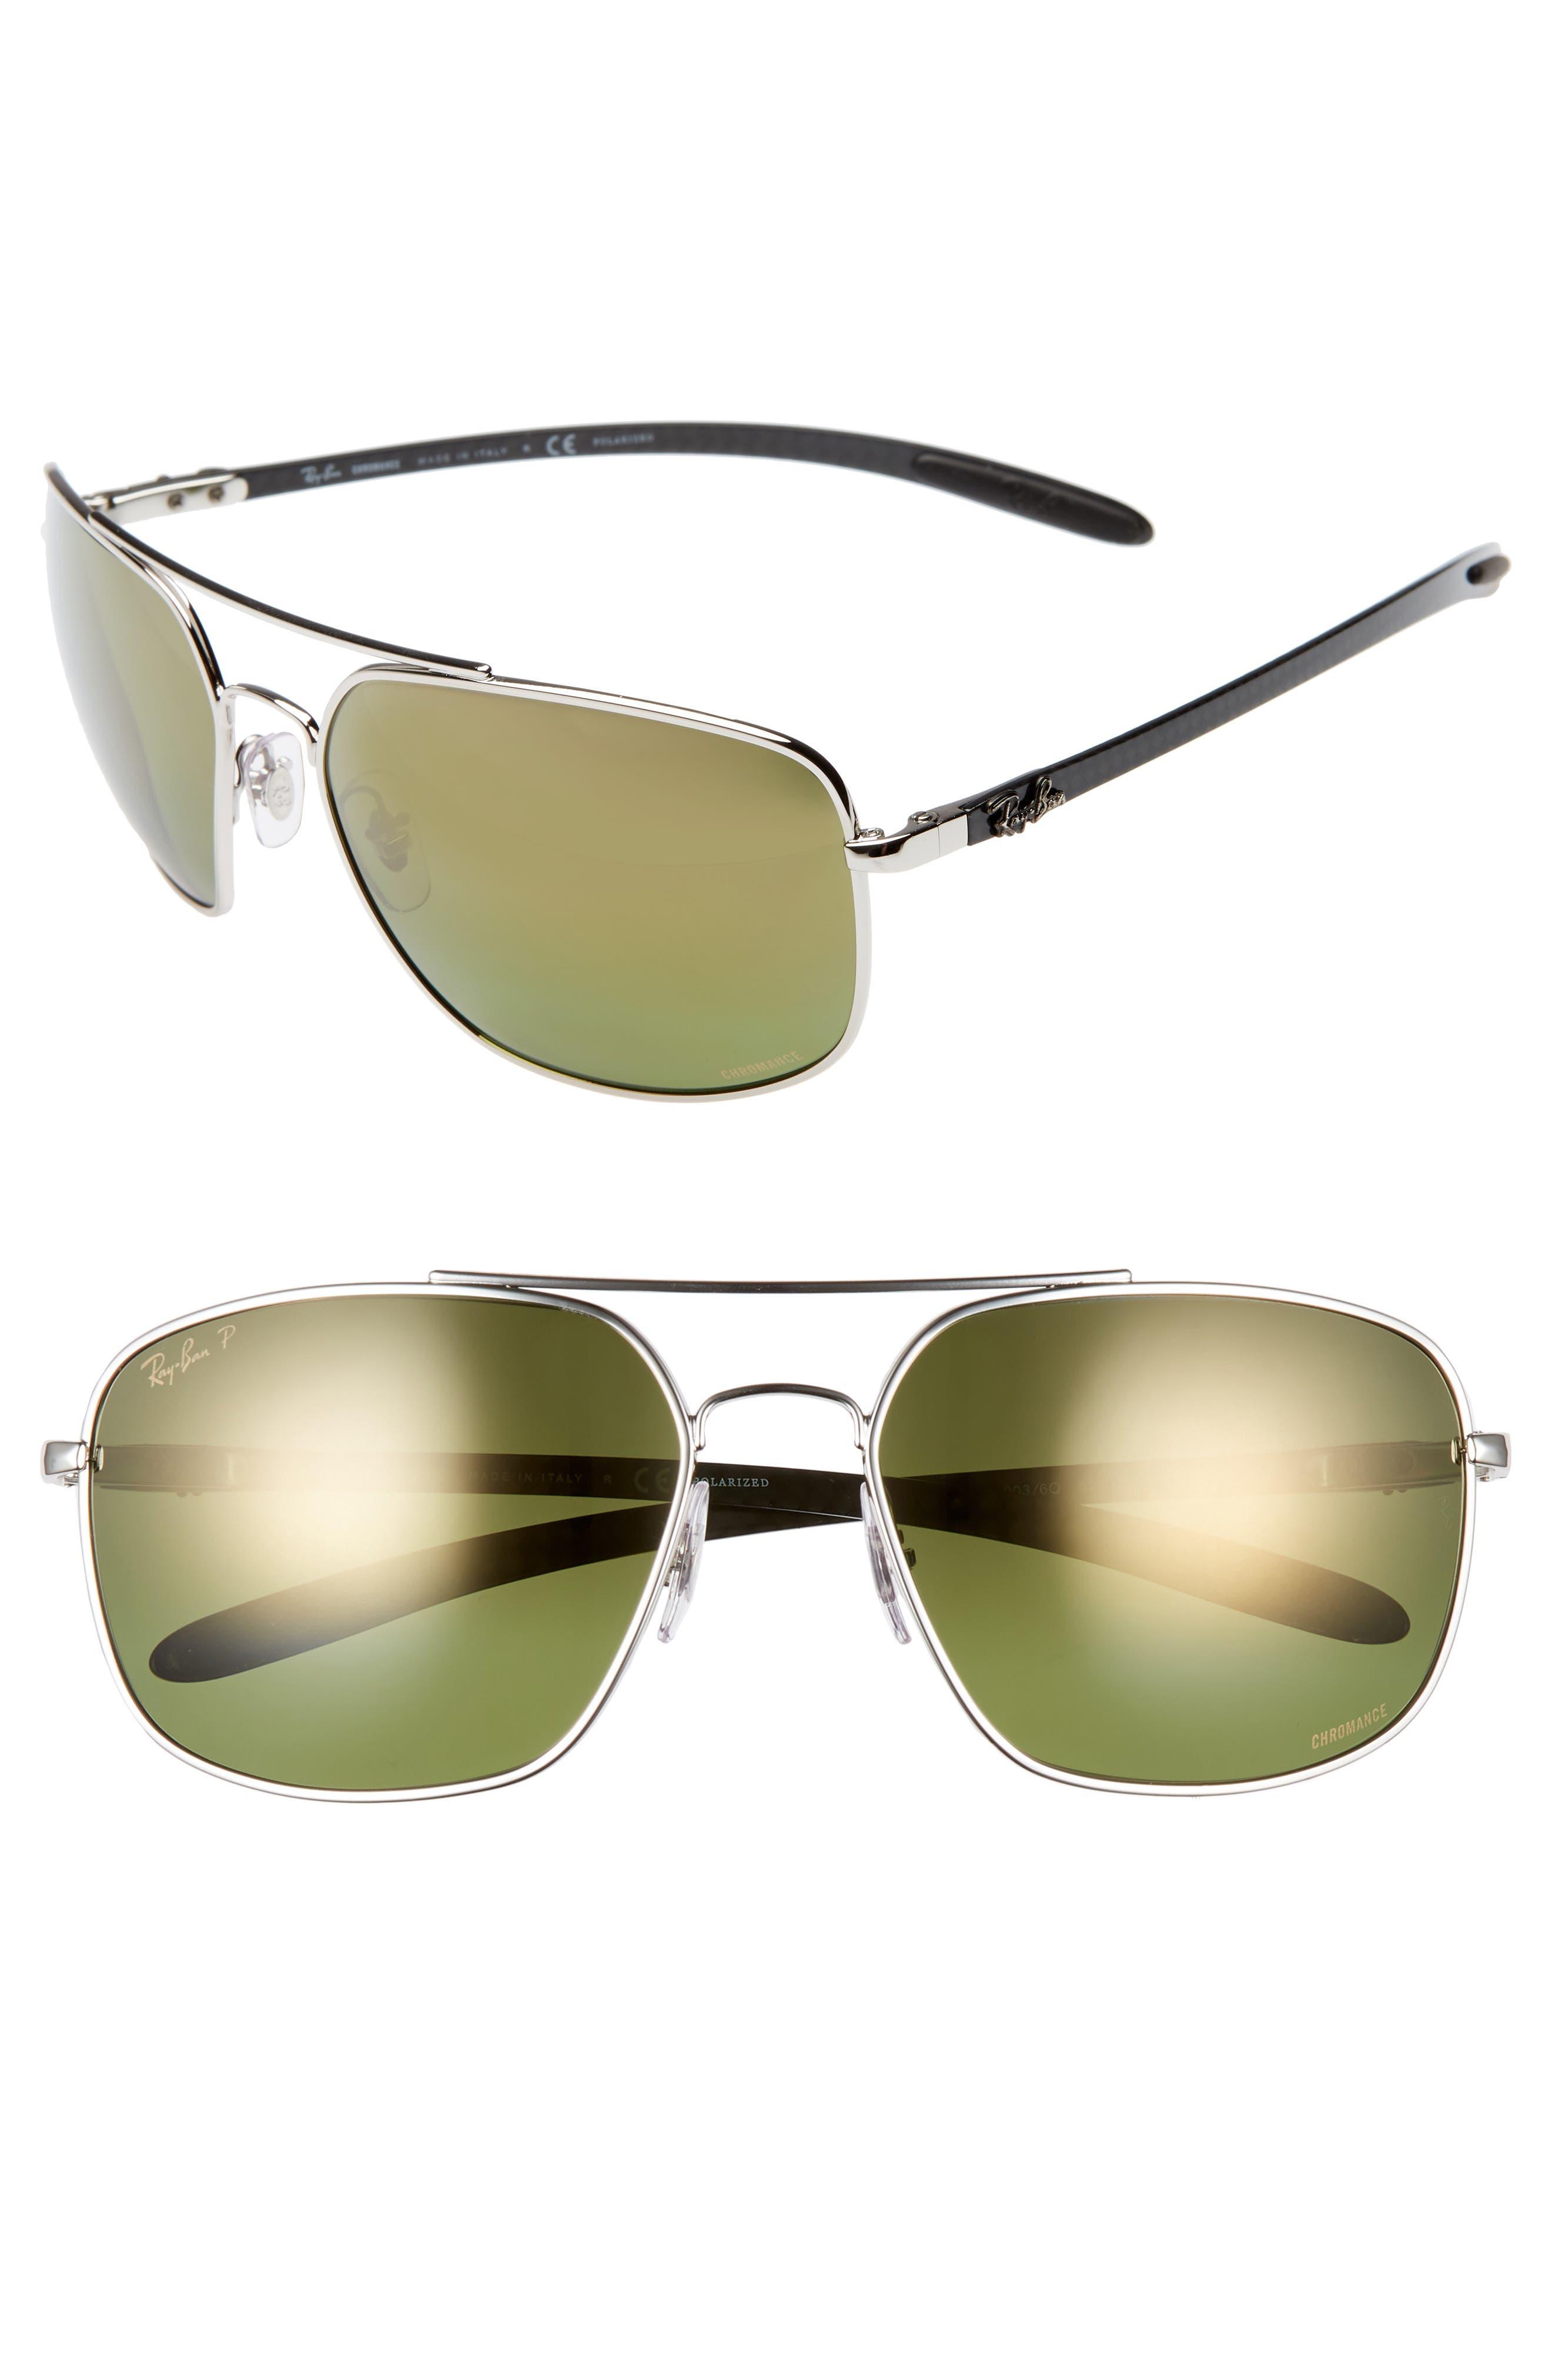 Ray-Ban 62Mm Polarized Square Sunglasses -